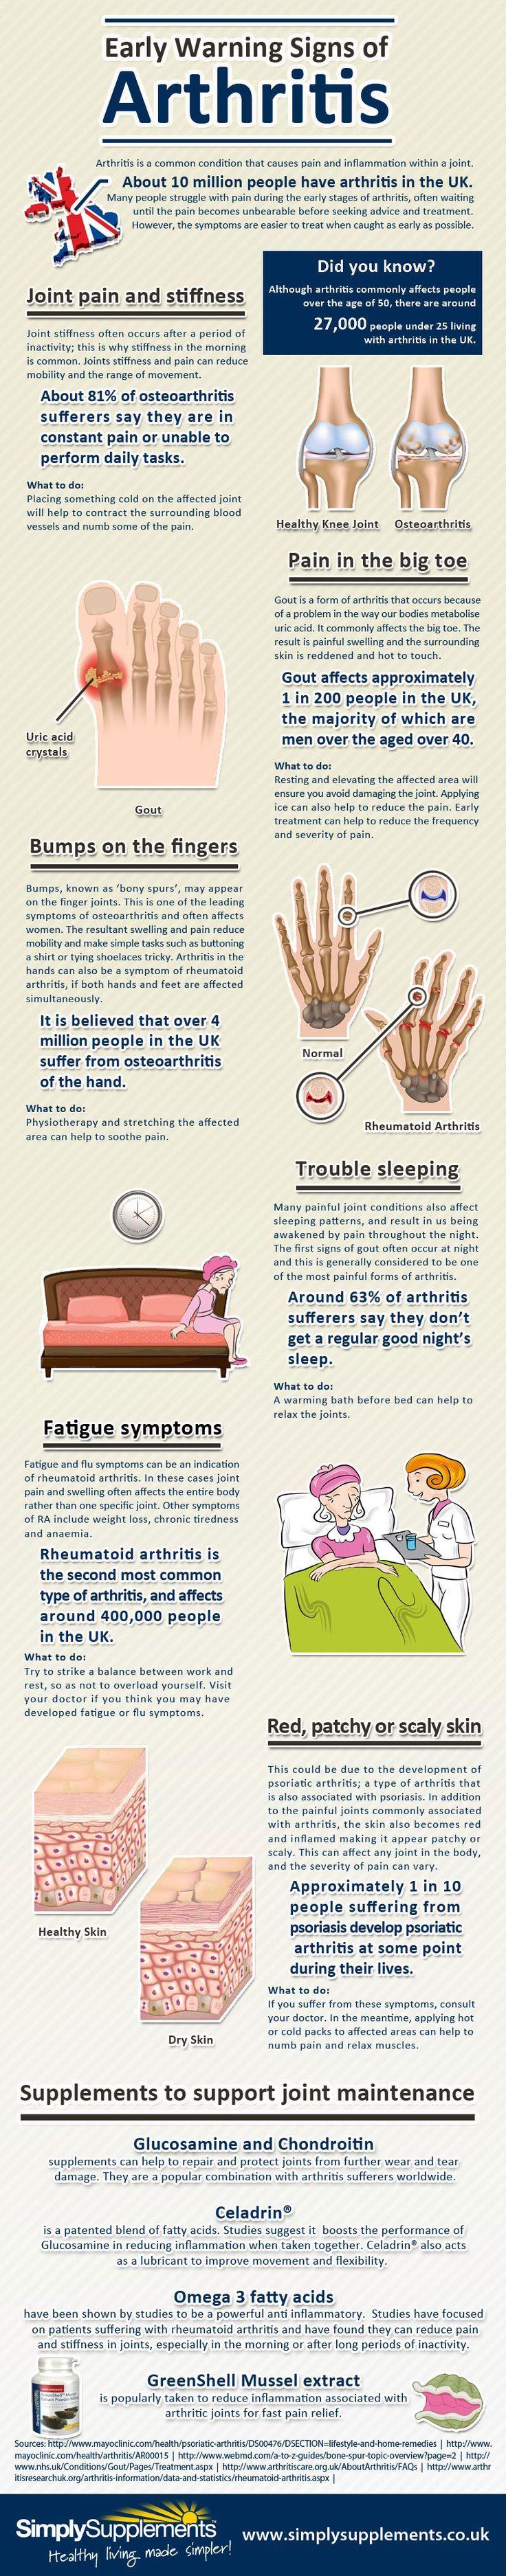 Signs of Arthritis